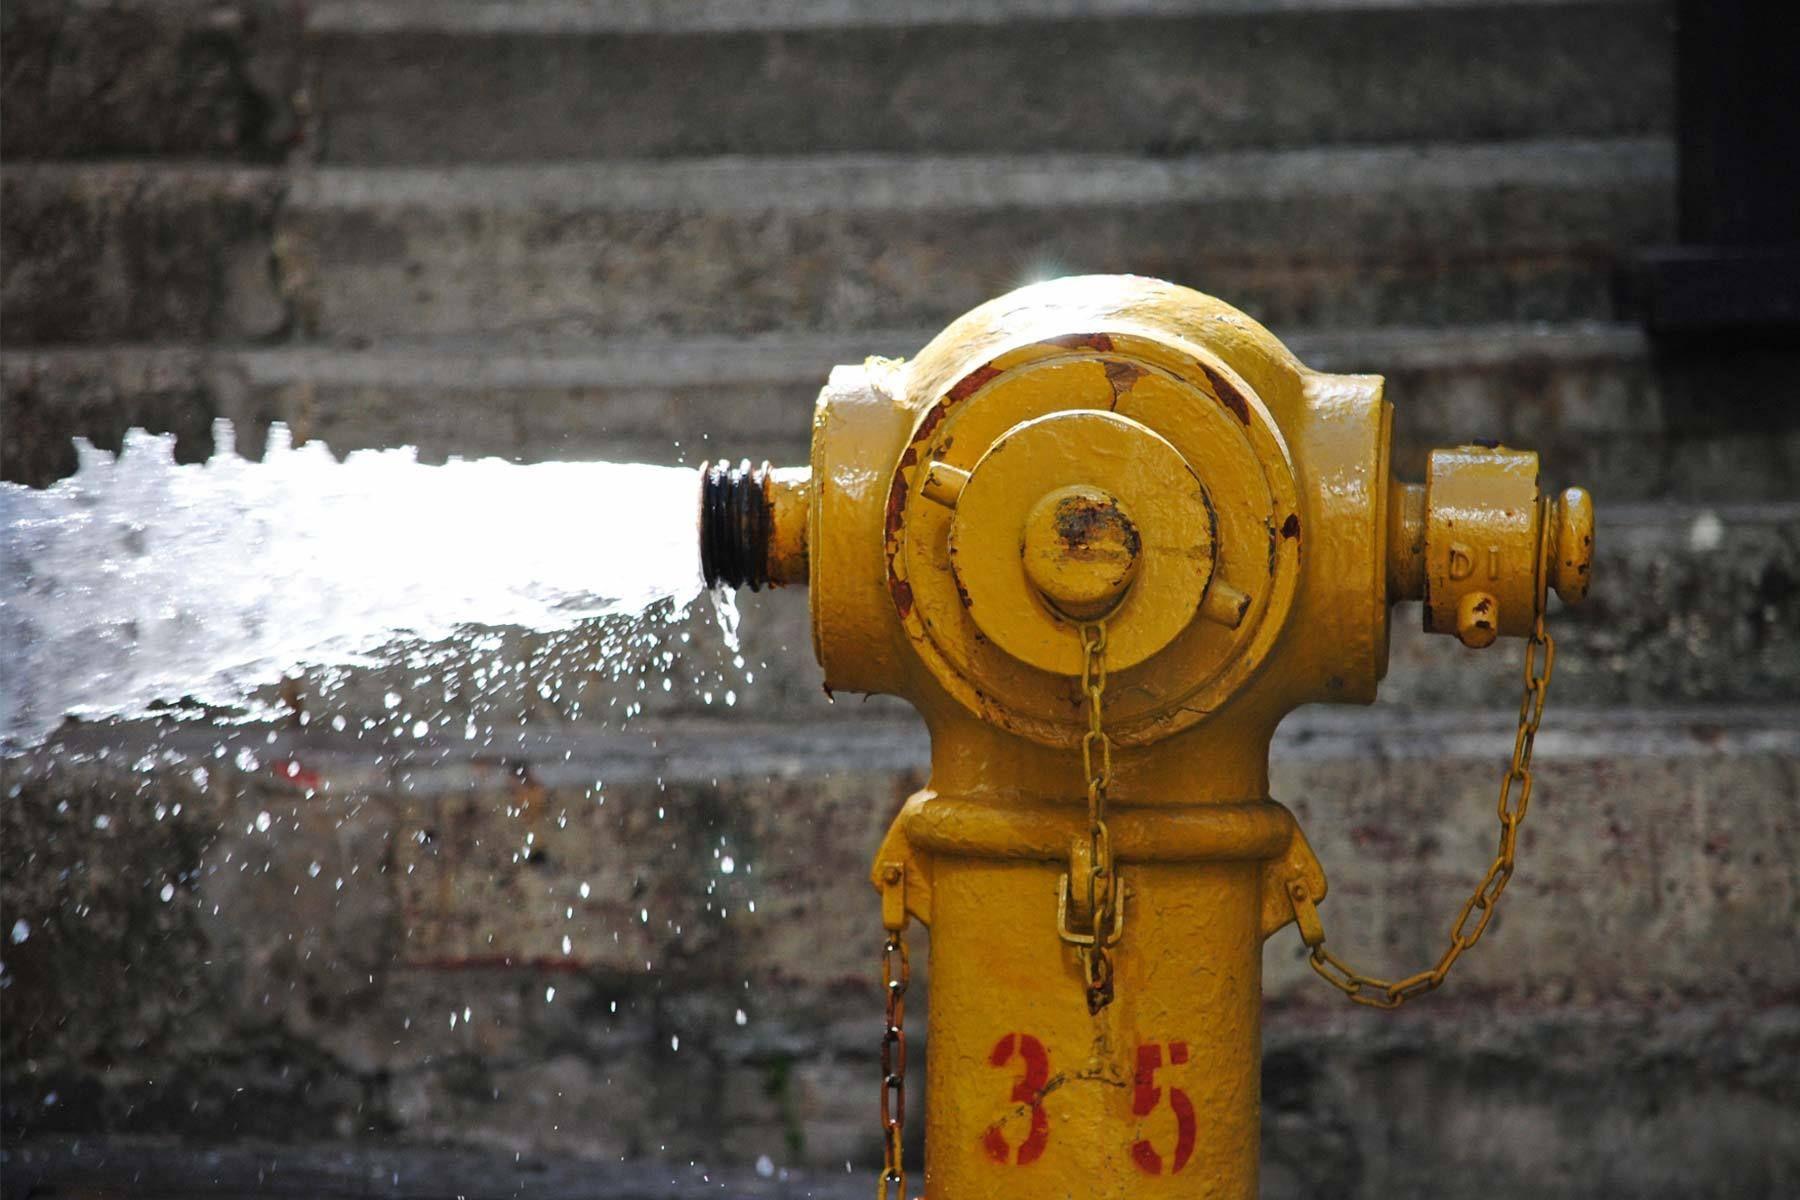 100___hk___fire_hydrant_03.jpg